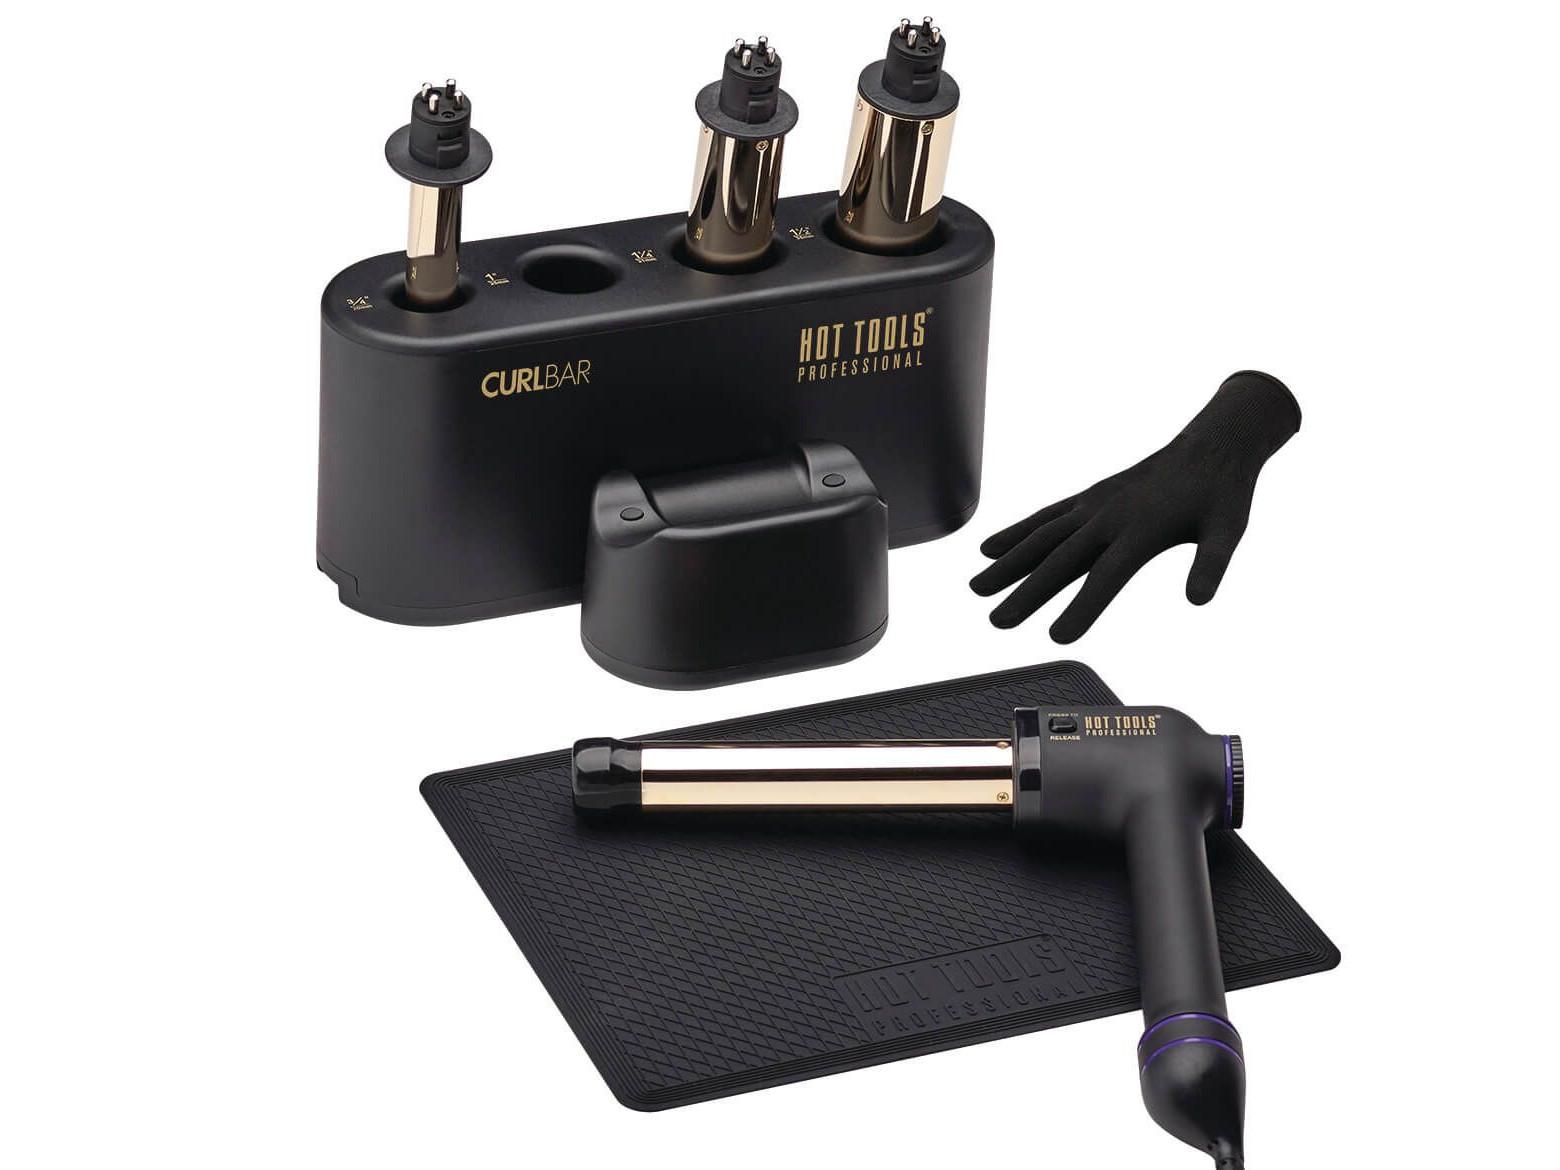 Kulma na vlasy Hot Tools 24K Gold Curl Bar Set - 19 mm, 25 mm, 32 mm, 38 mm (HTCURLSETUK) + DÁREK ZD